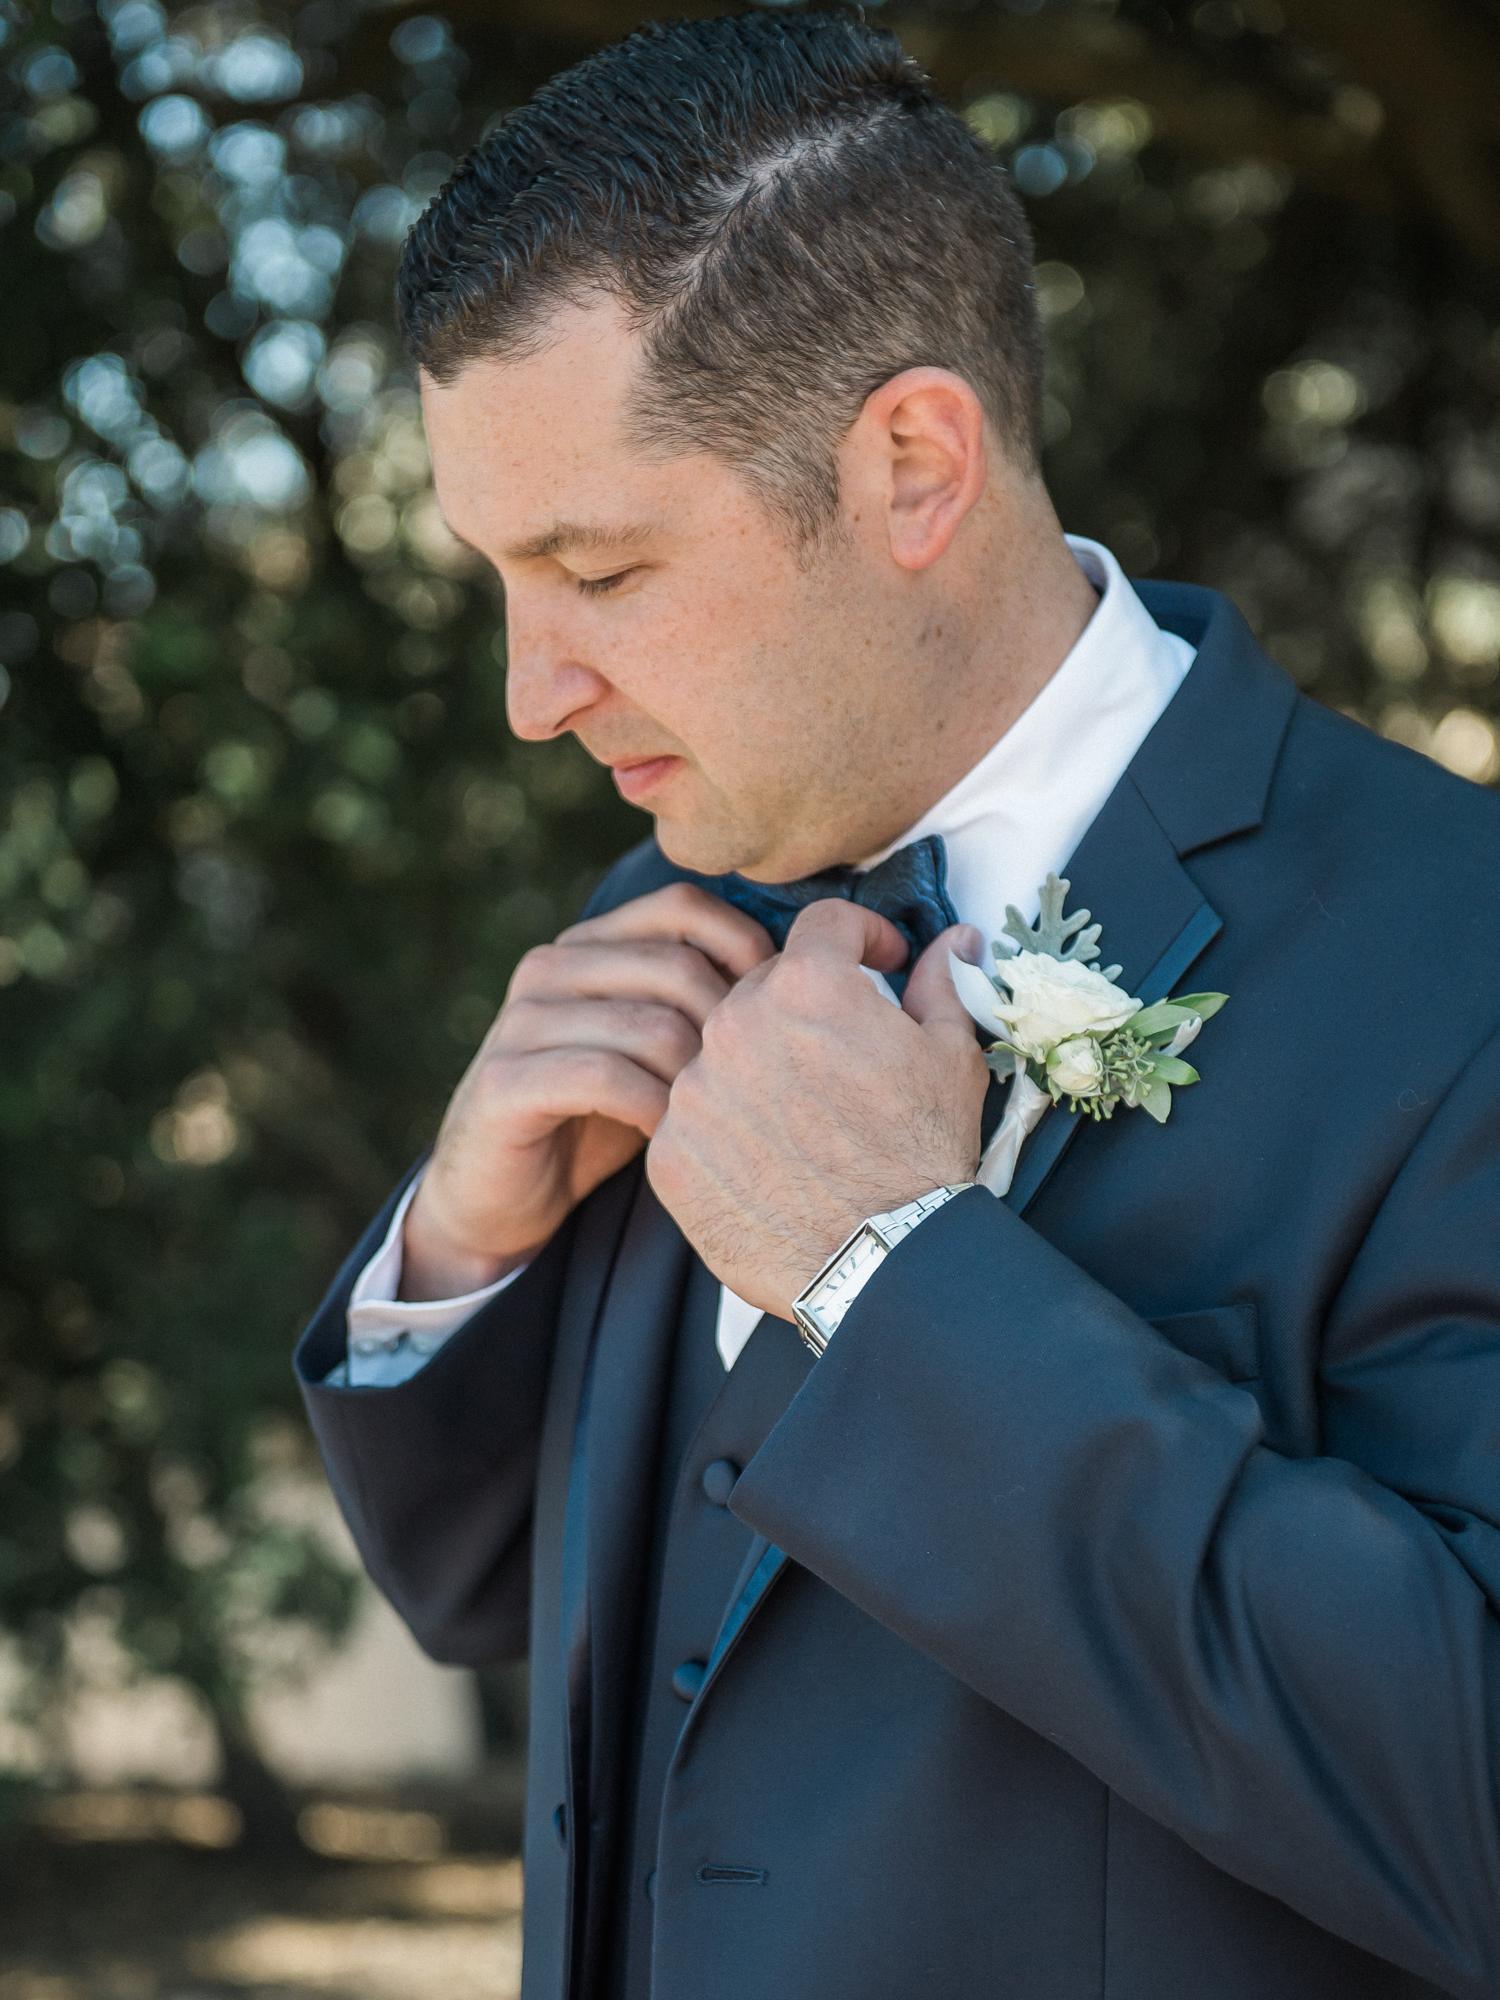 Aimee+Logan_wedding_spp-30.jpg